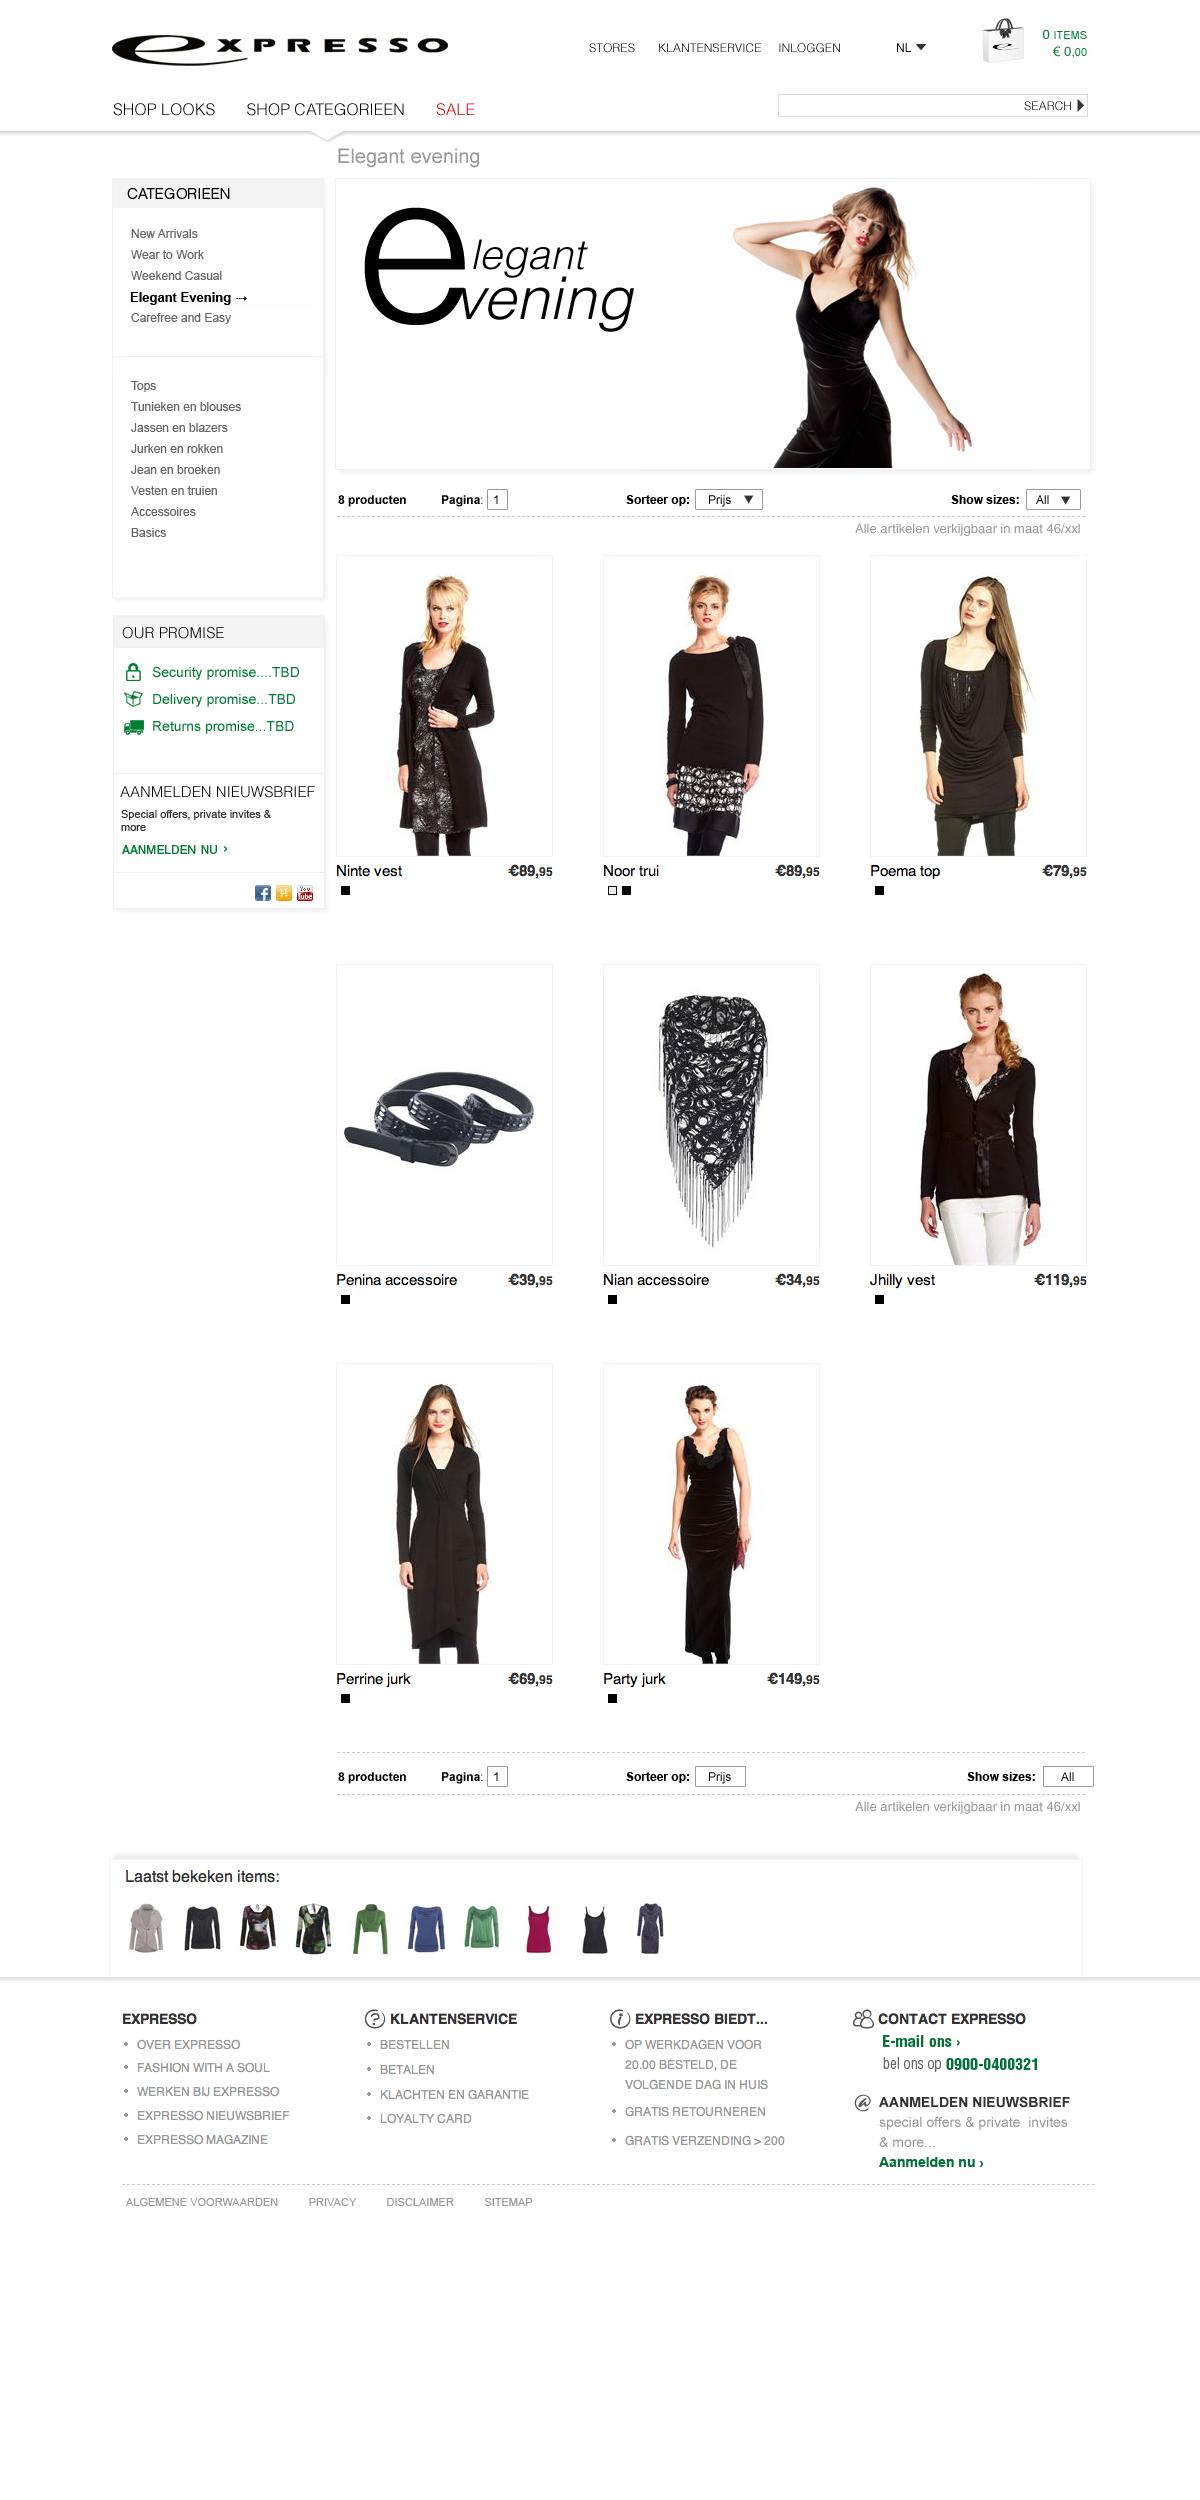 Expresso, Fashion Brand (Europe)